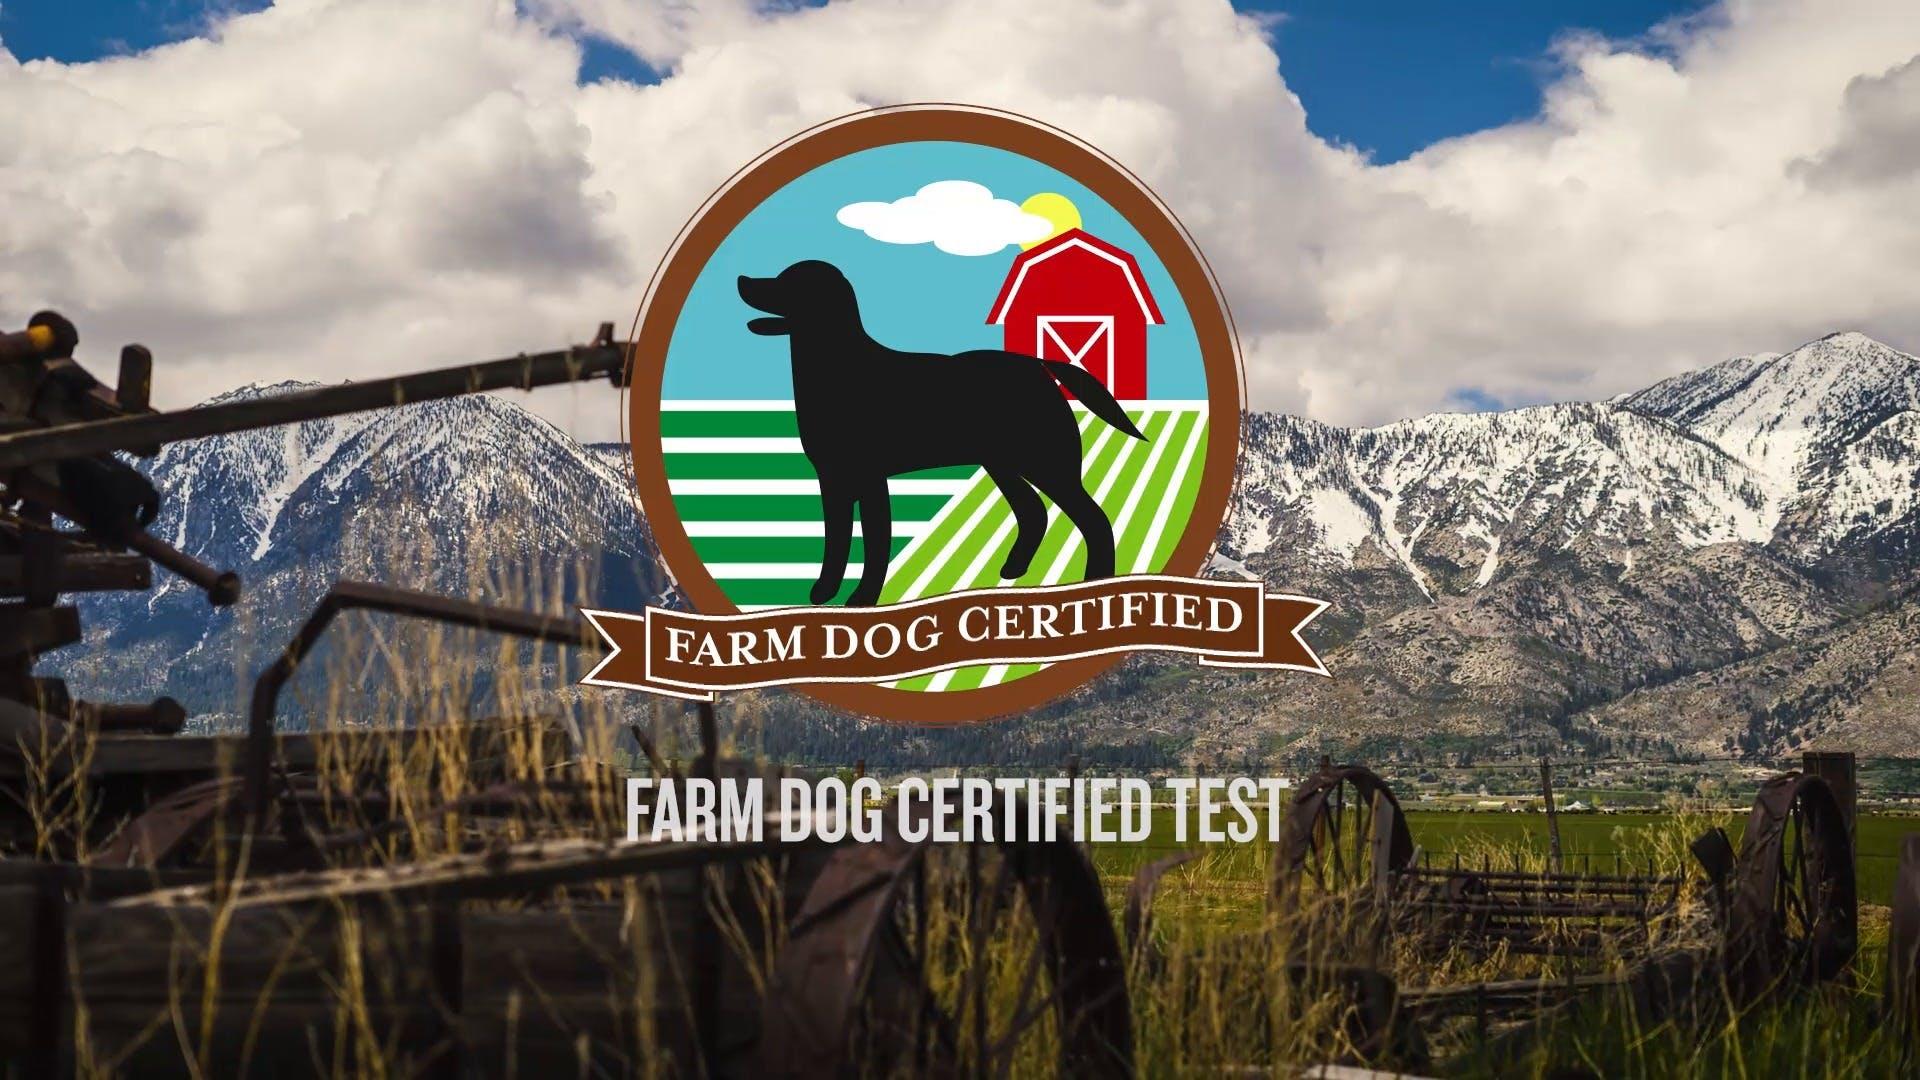 Intro to AKC - Farm Dog Certification Test   AKC.TV